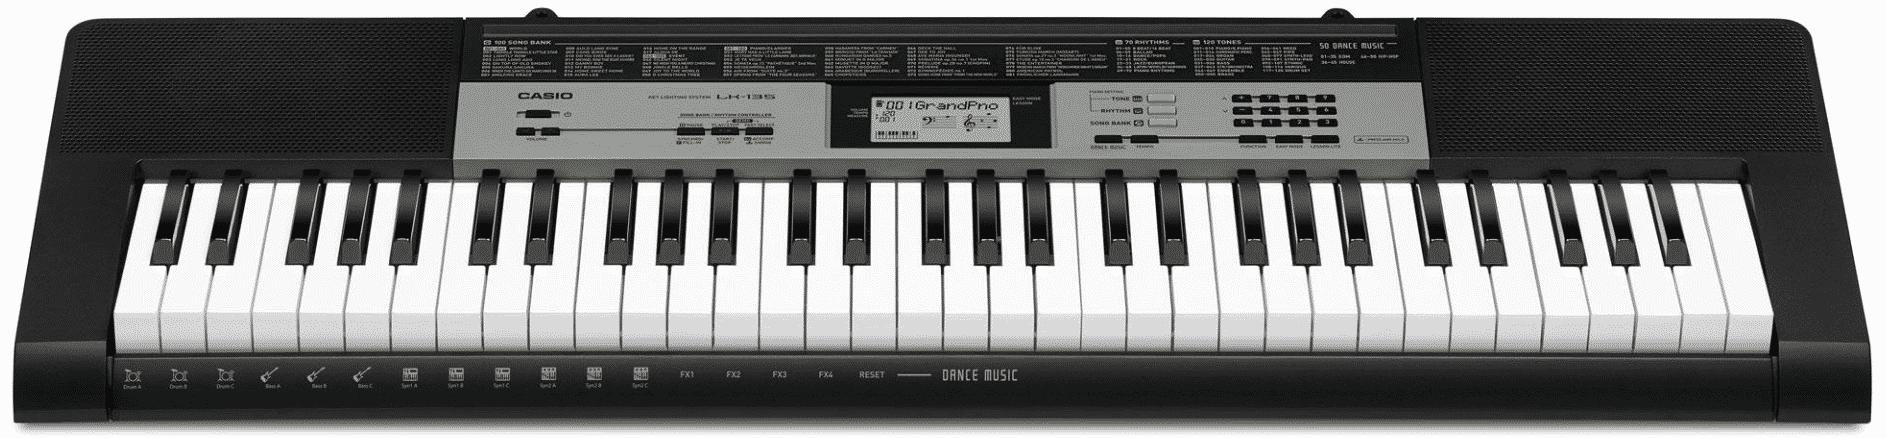 Casio LK 135